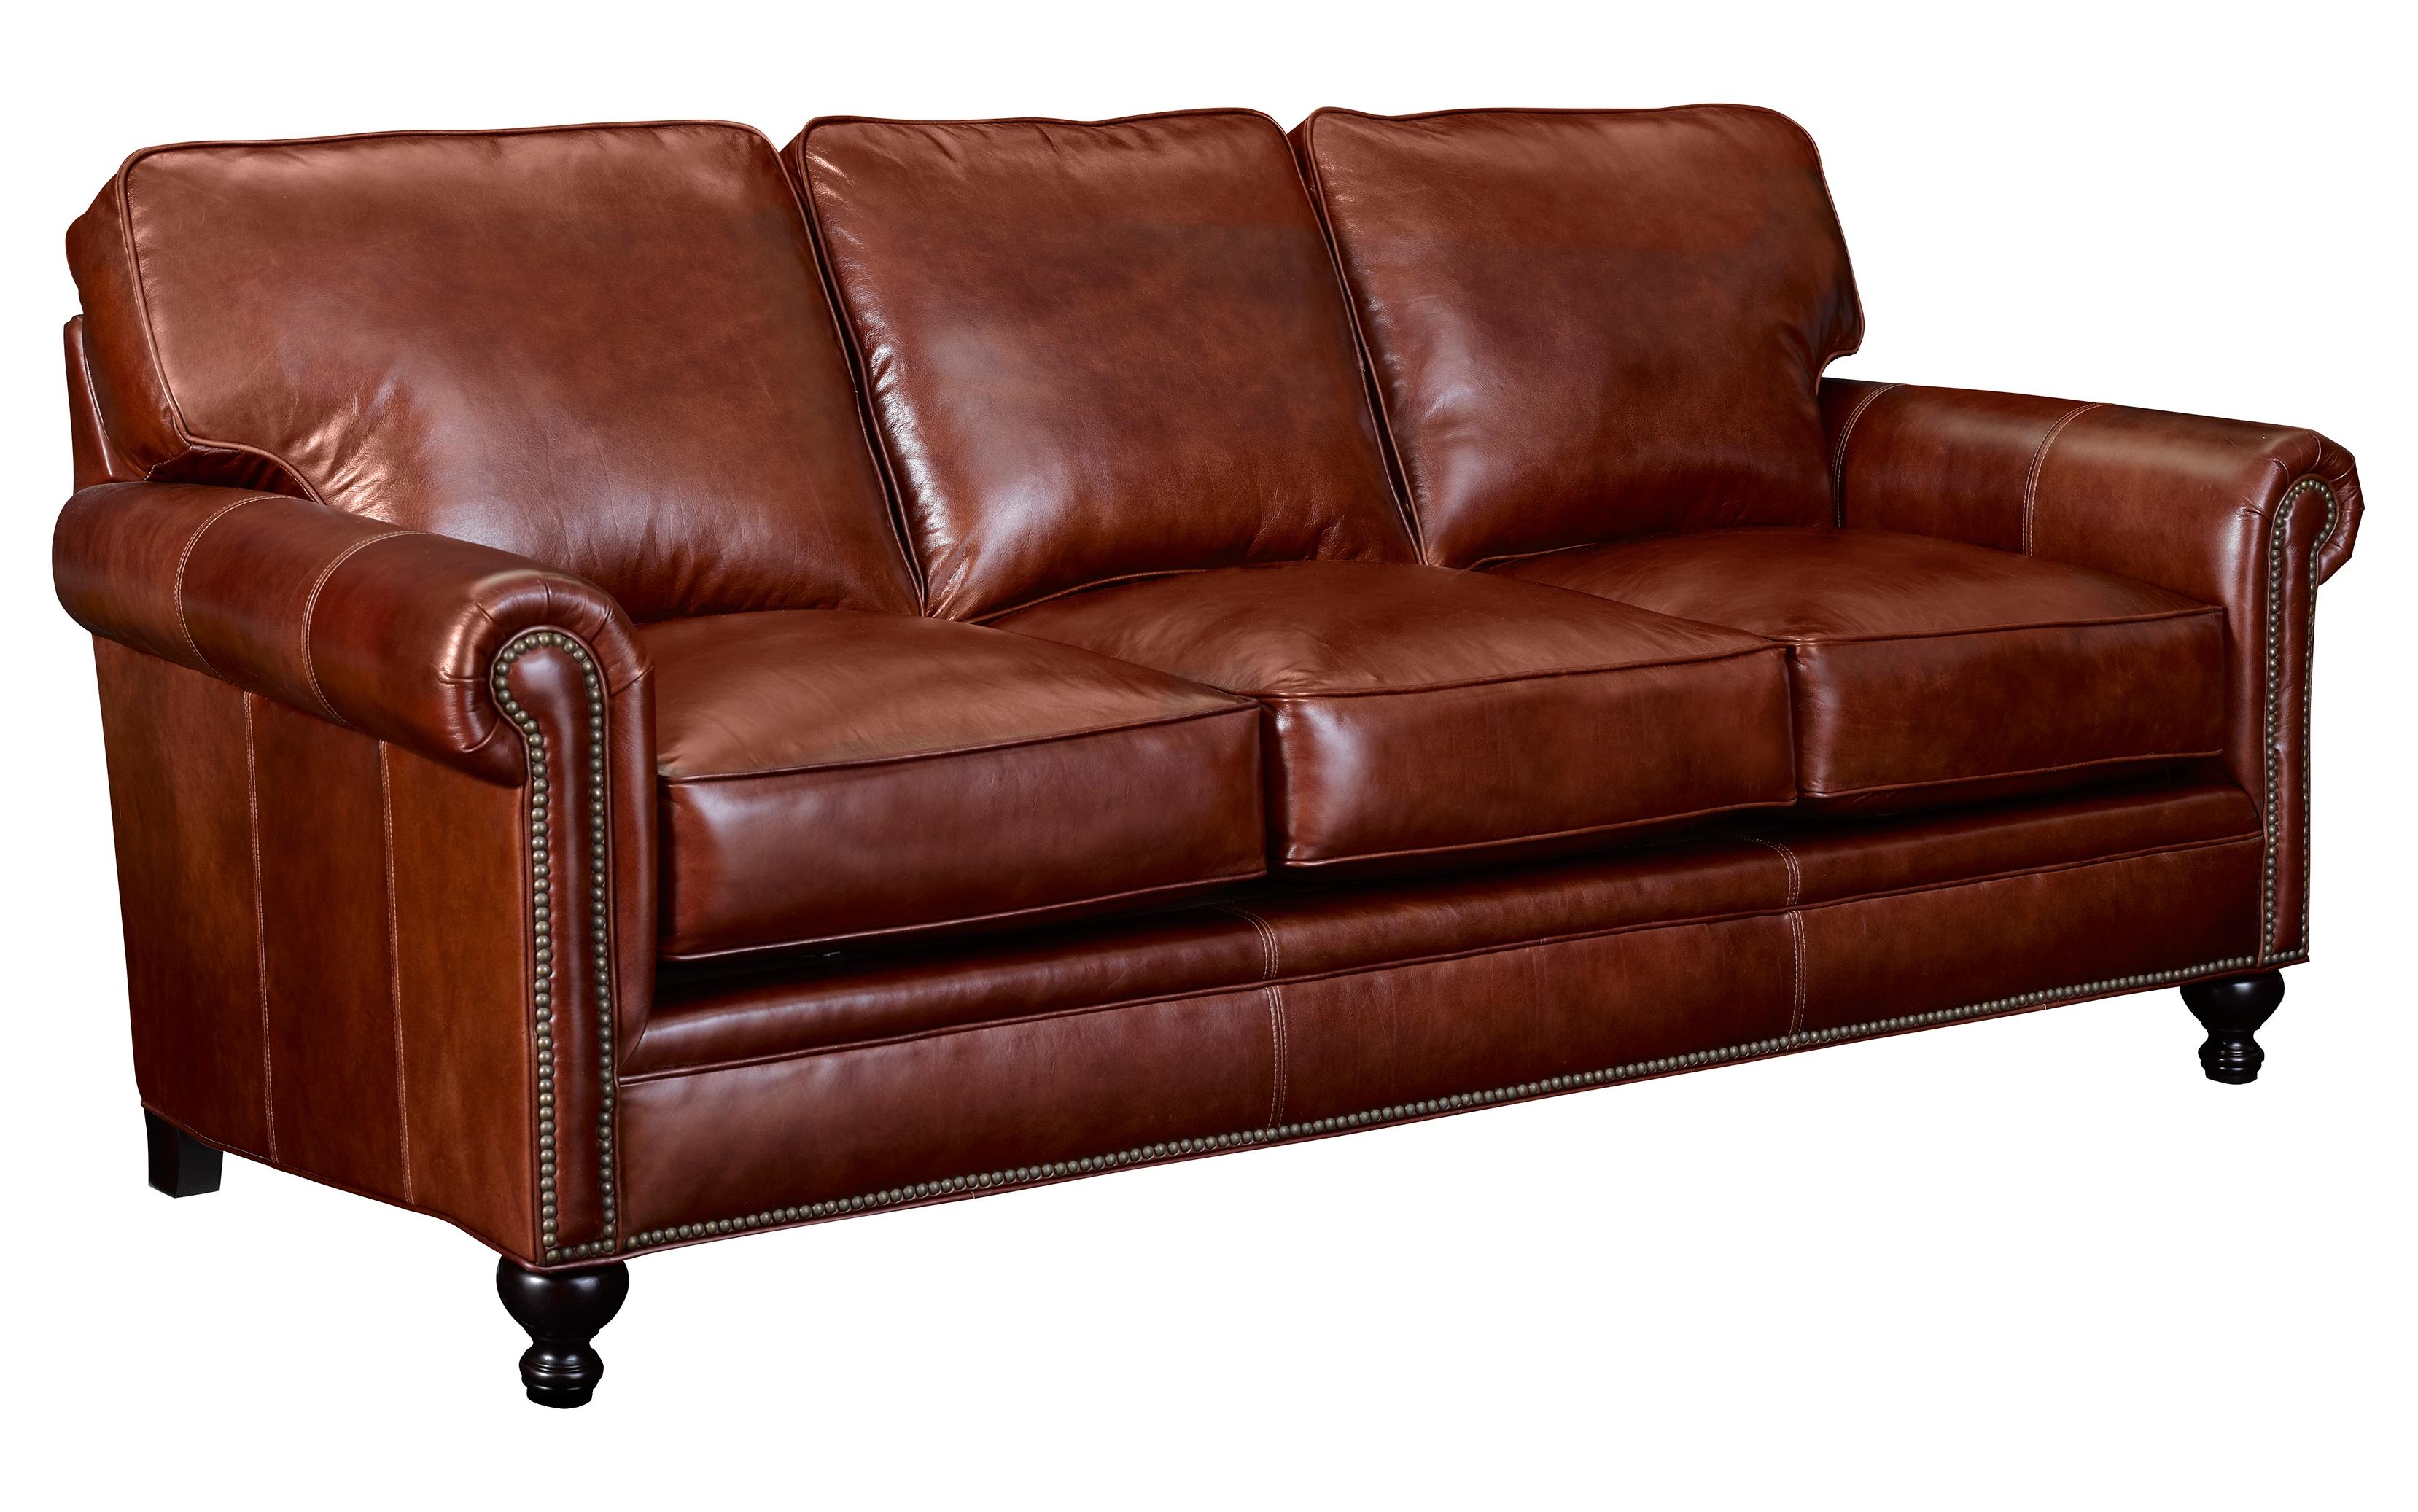 Pleasing Harrison 6751 Sofa Collection Sofas And Sectionals Creativecarmelina Interior Chair Design Creativecarmelinacom